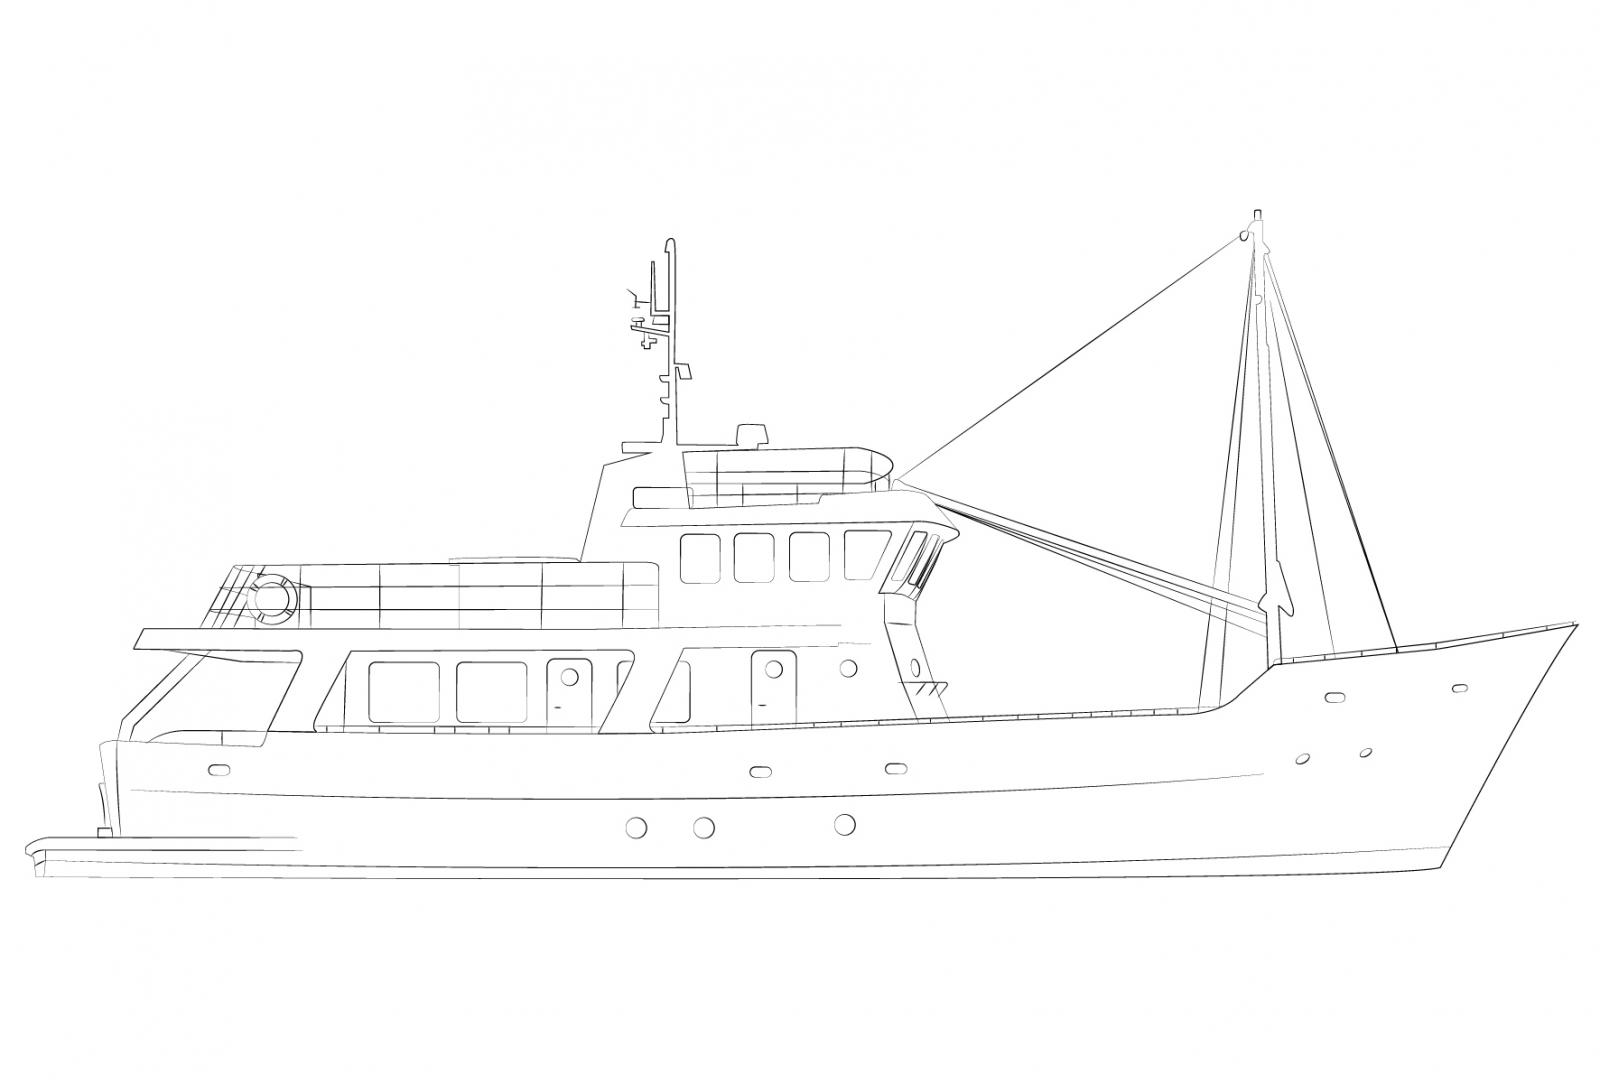 Vripack Doggersbank Research vessel 75